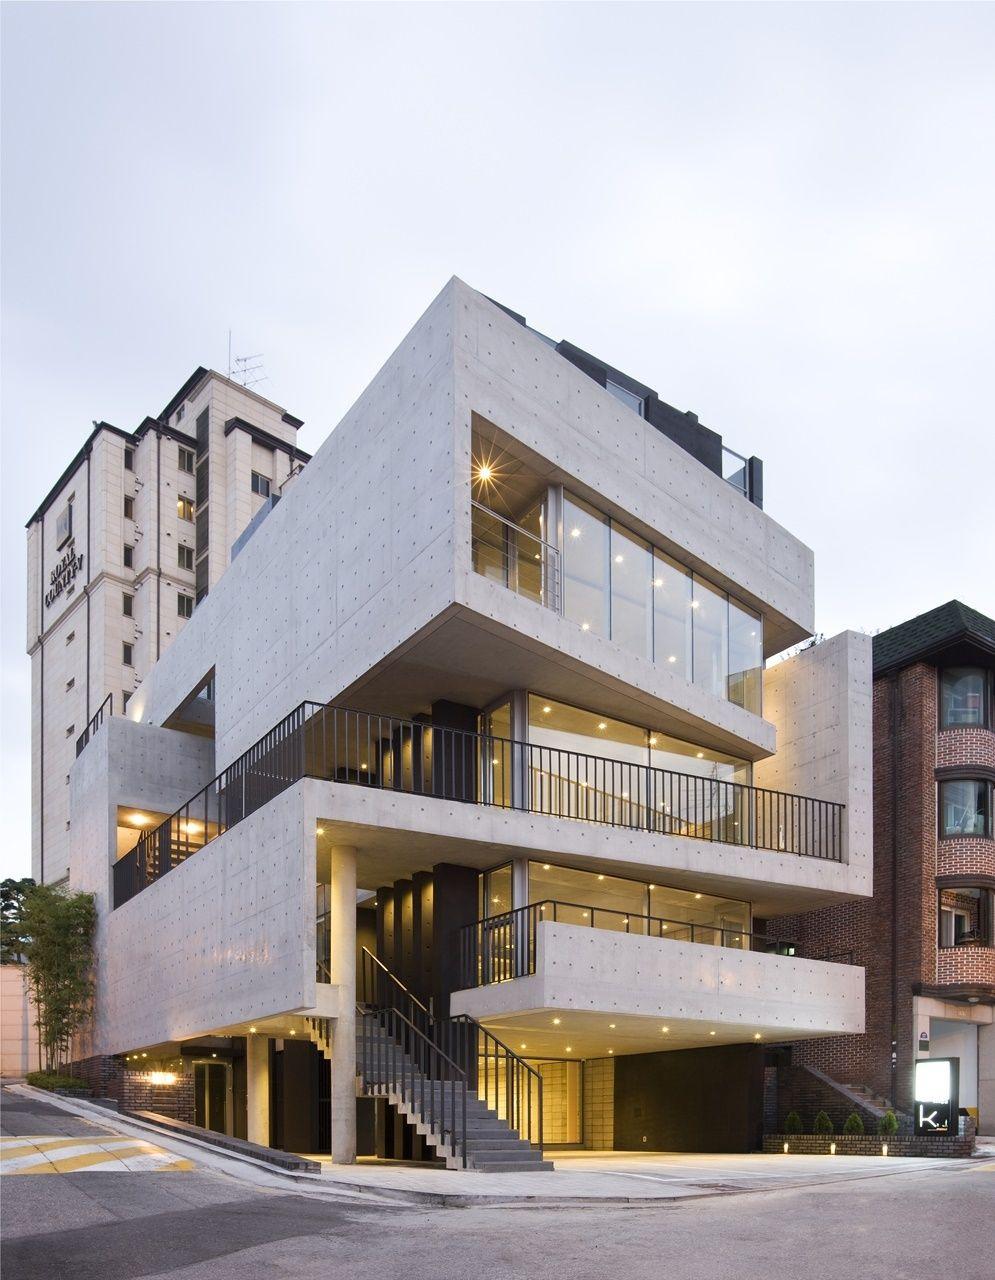 gallery of bati rieul l 39 eau design 1 exterior office pinterest architecture design. Black Bedroom Furniture Sets. Home Design Ideas